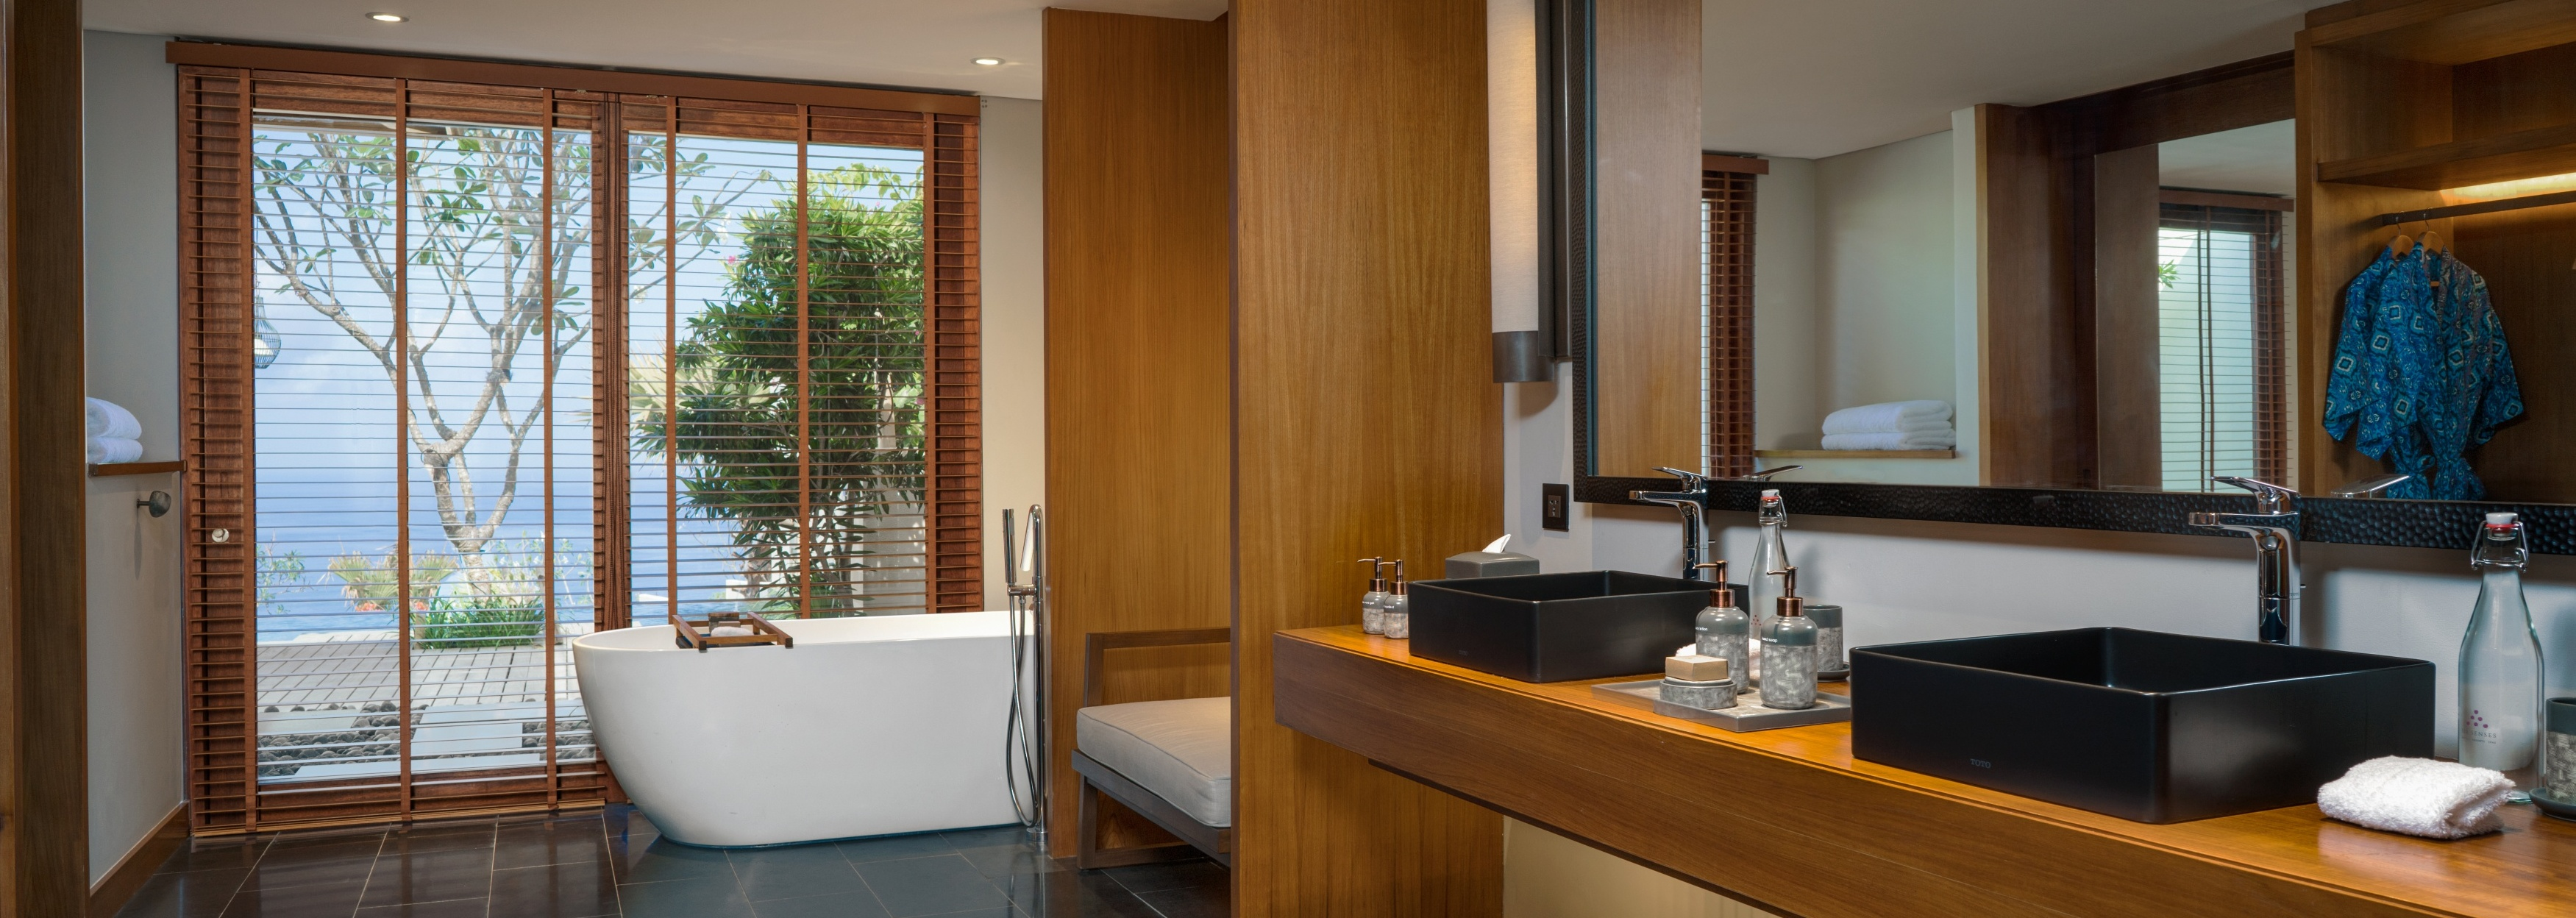 six-senses-uluwatu-luxury-bathroom